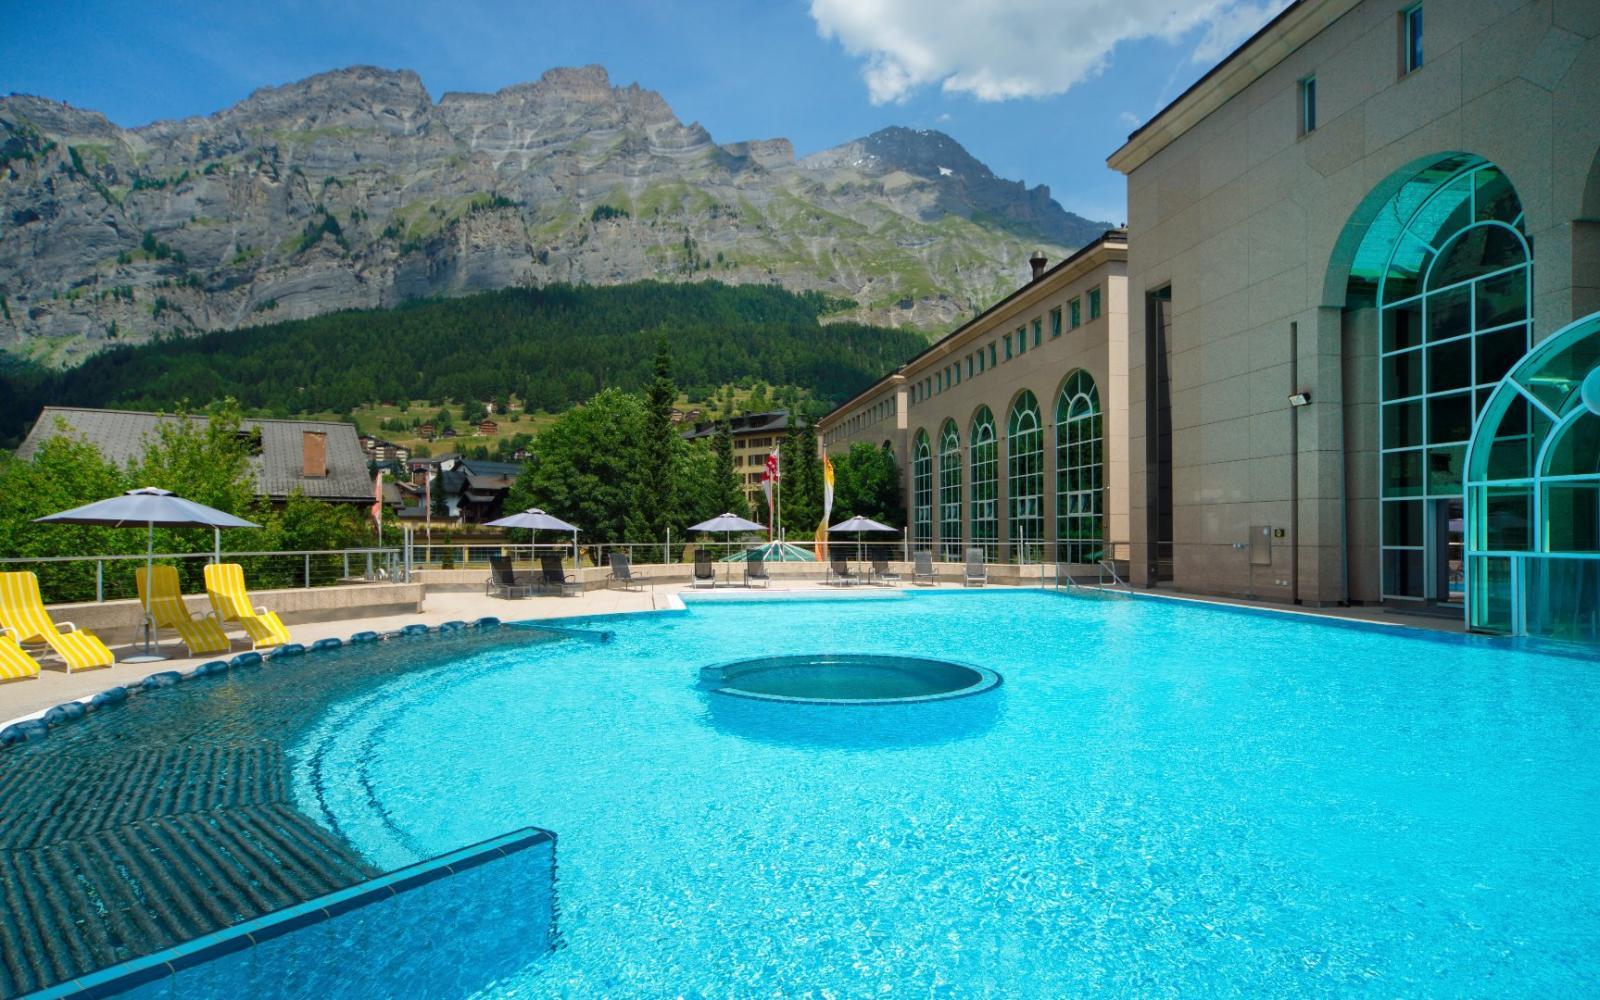 Heliopark Hotels & Alpentherme Bilder | Bild 1